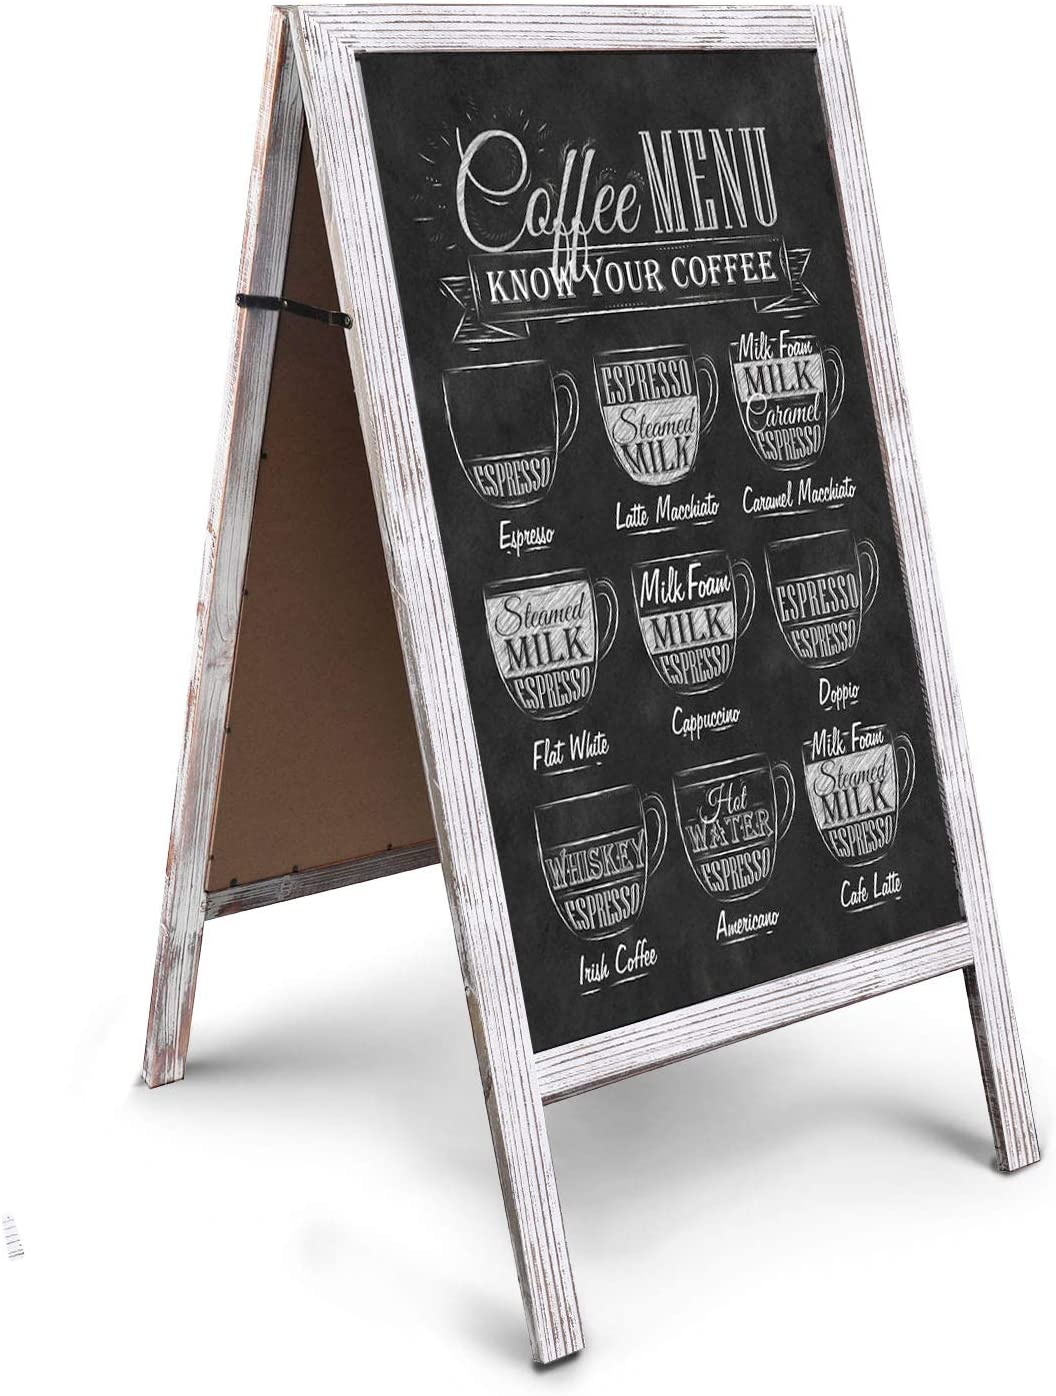 Chalkboard Easel,Store Display Sign Blackboard 40 RHF Double Sided Chalk Board Sign,Sidewalk Sign,Sandwich Chalkboards,Rustic Freestanding A-Frame Wedding Decoration,Non-Porous Message